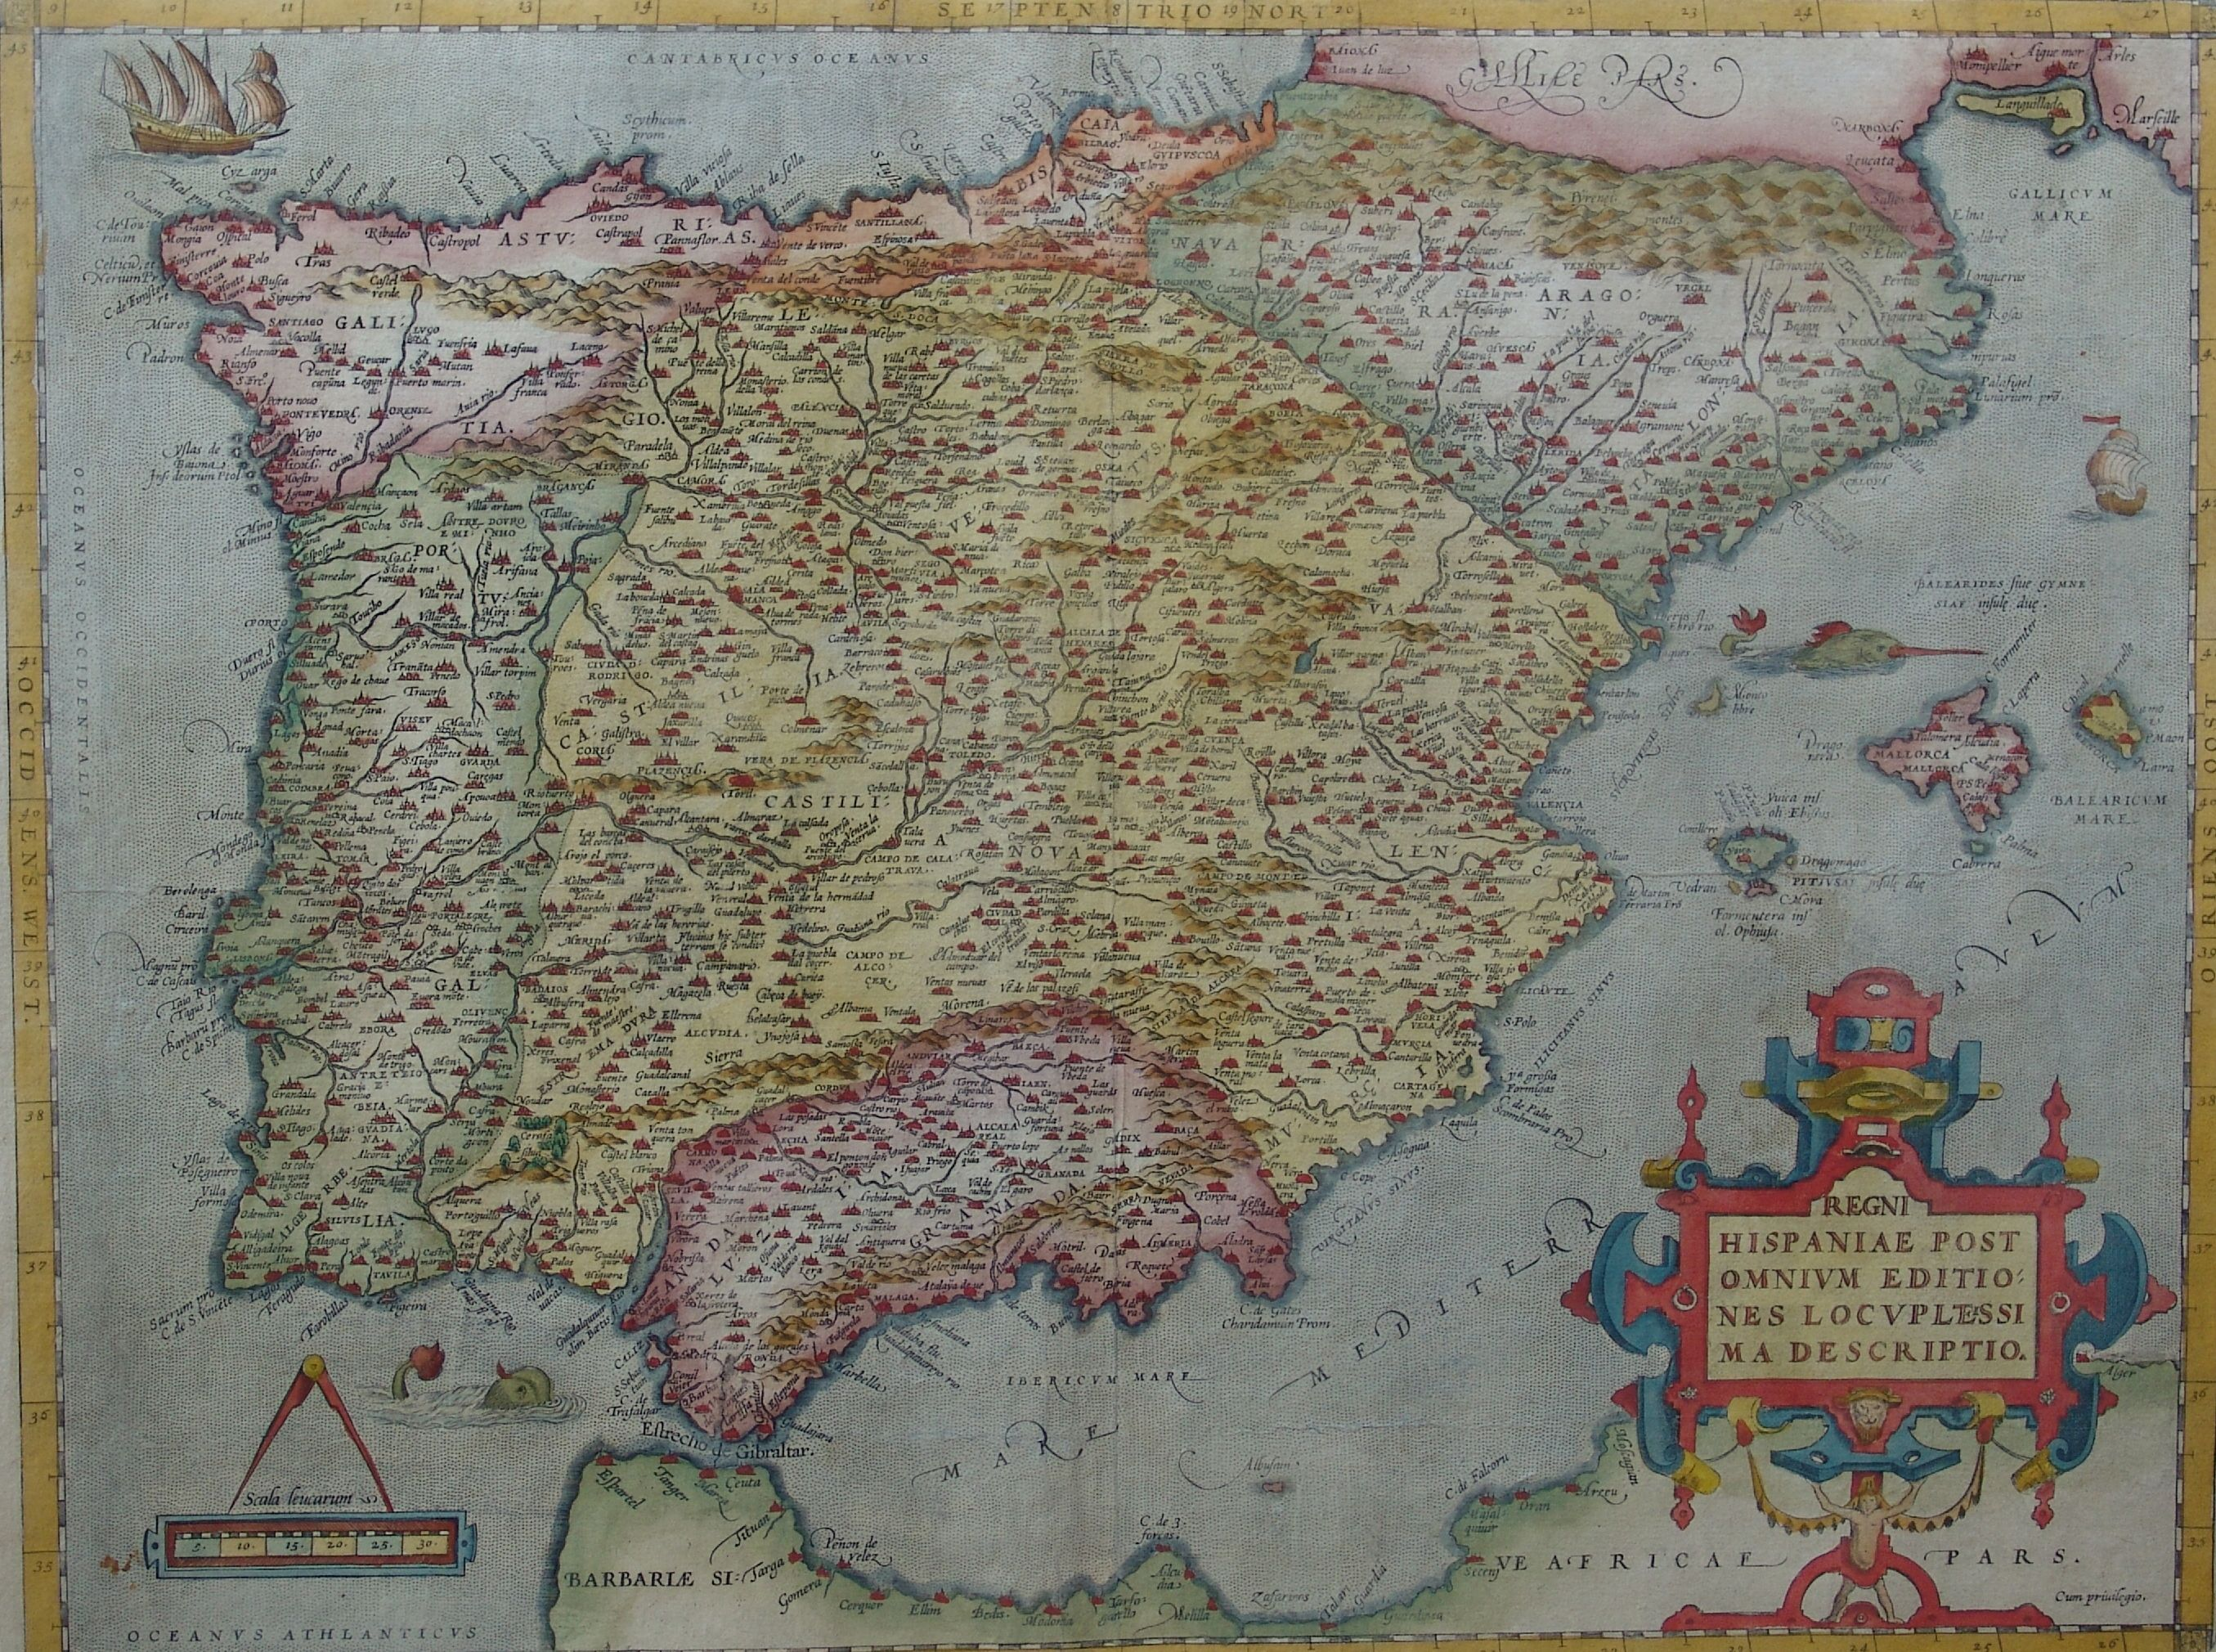 File:MAPA DE ESPAÑA EN 1570.jpg